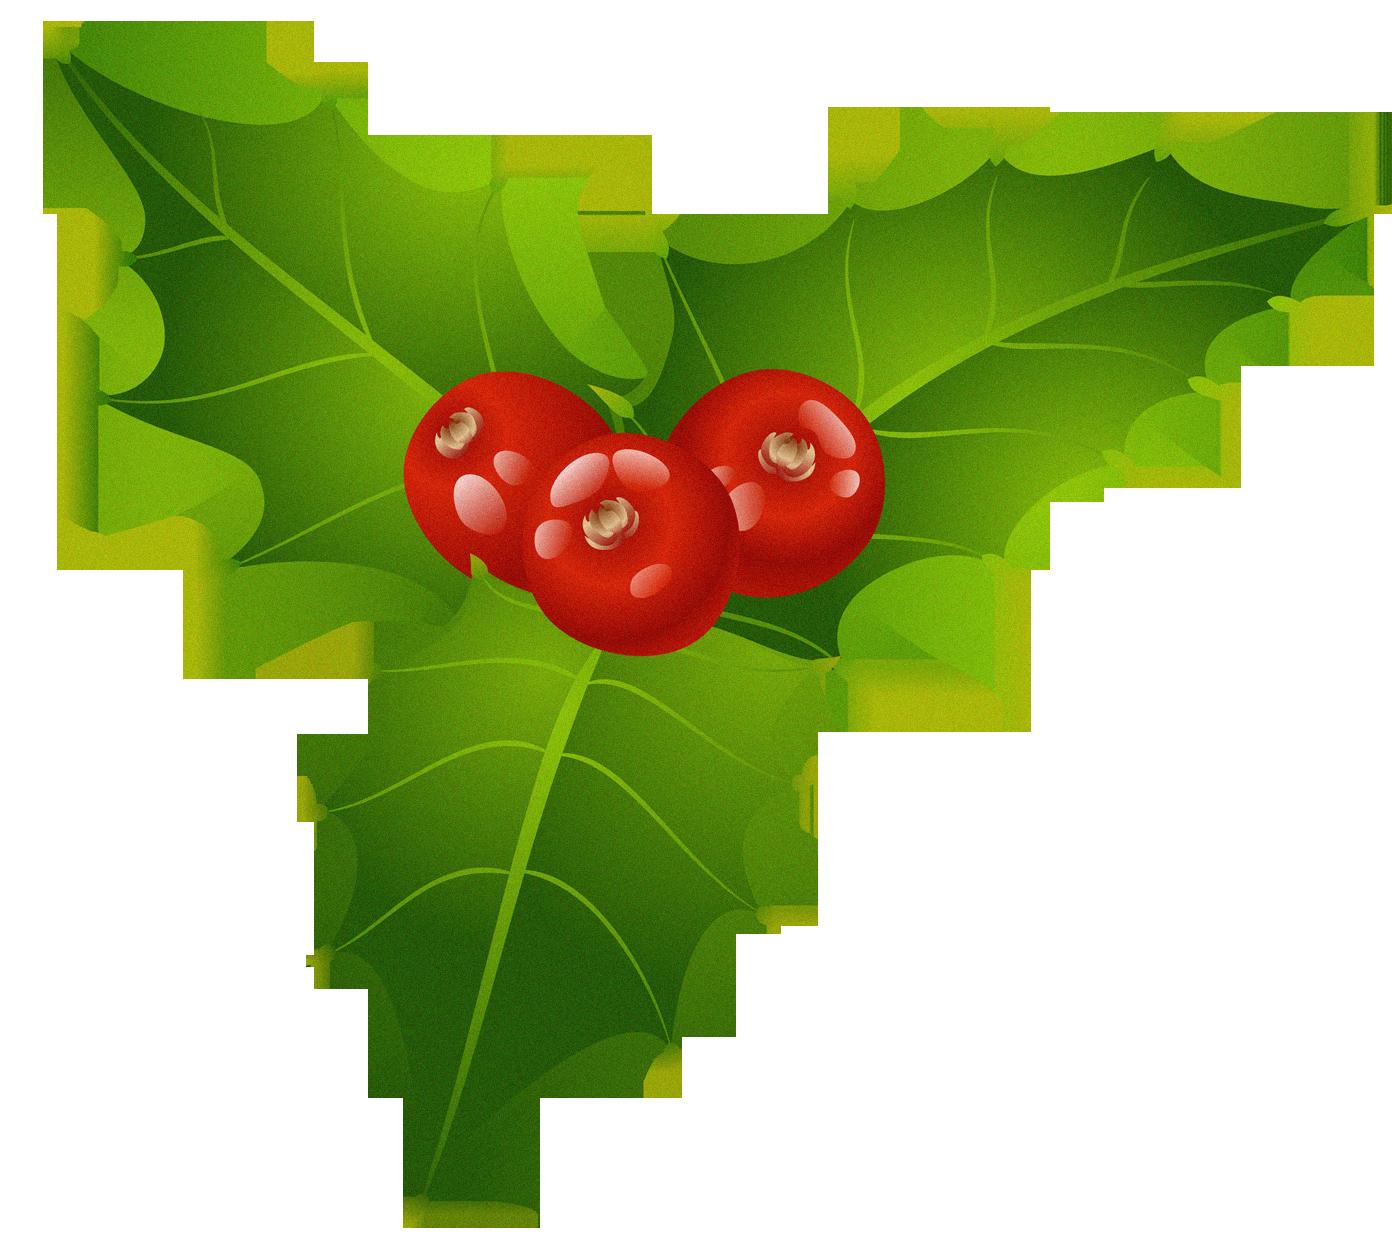 christmas mistletoe png clipart christmas sticker pinterest rh pinterest com au mistletoe clipart black and white mistletoe clipart border